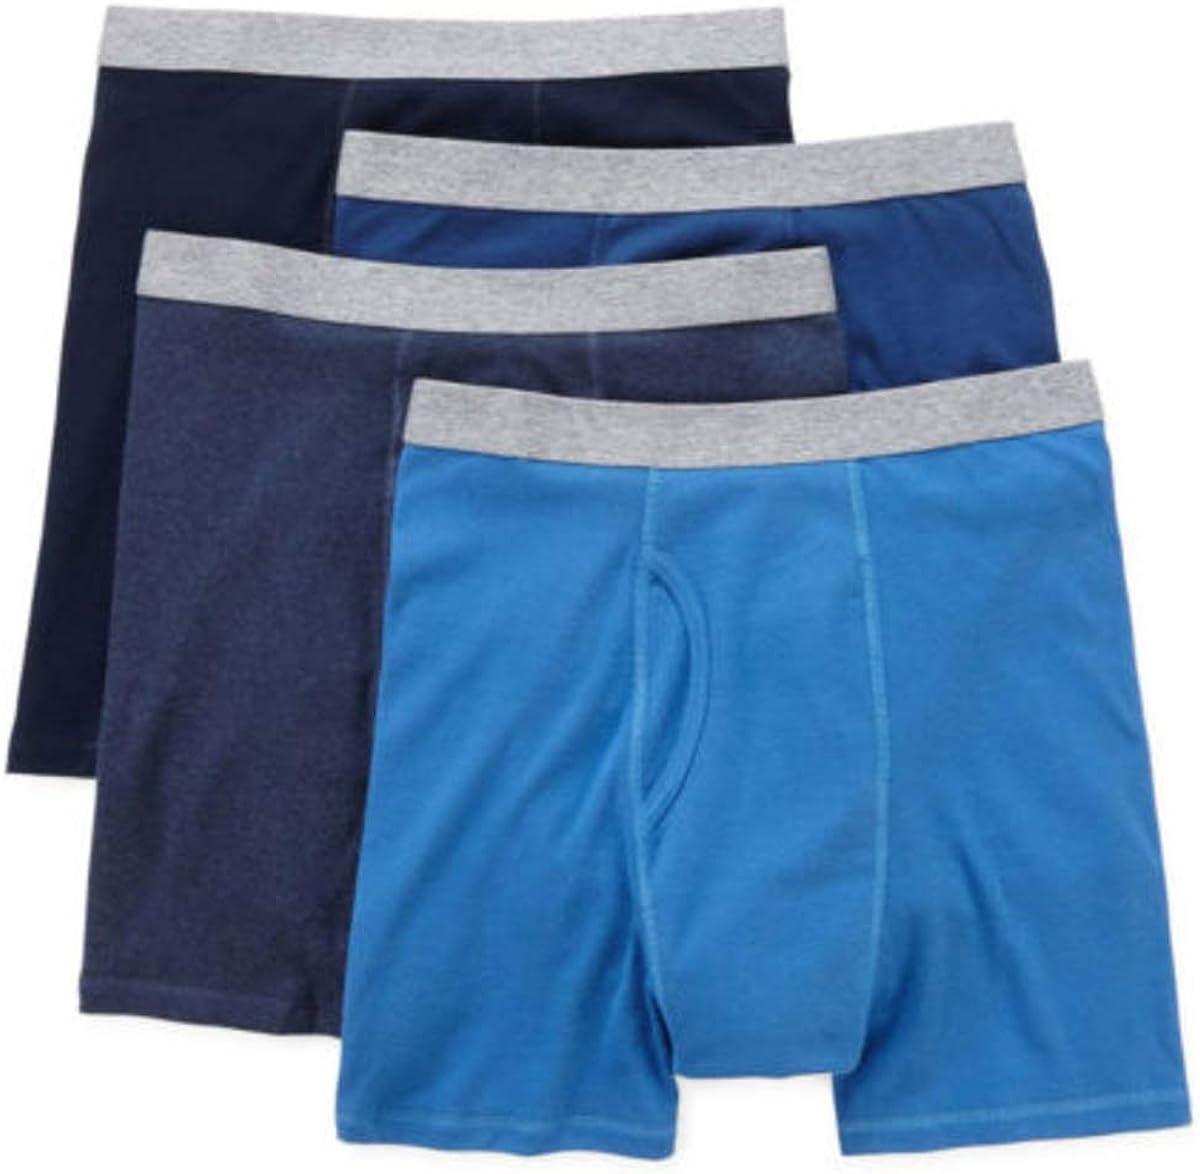 Stafford 4 Pack Boxer Briefs 100% Cotton